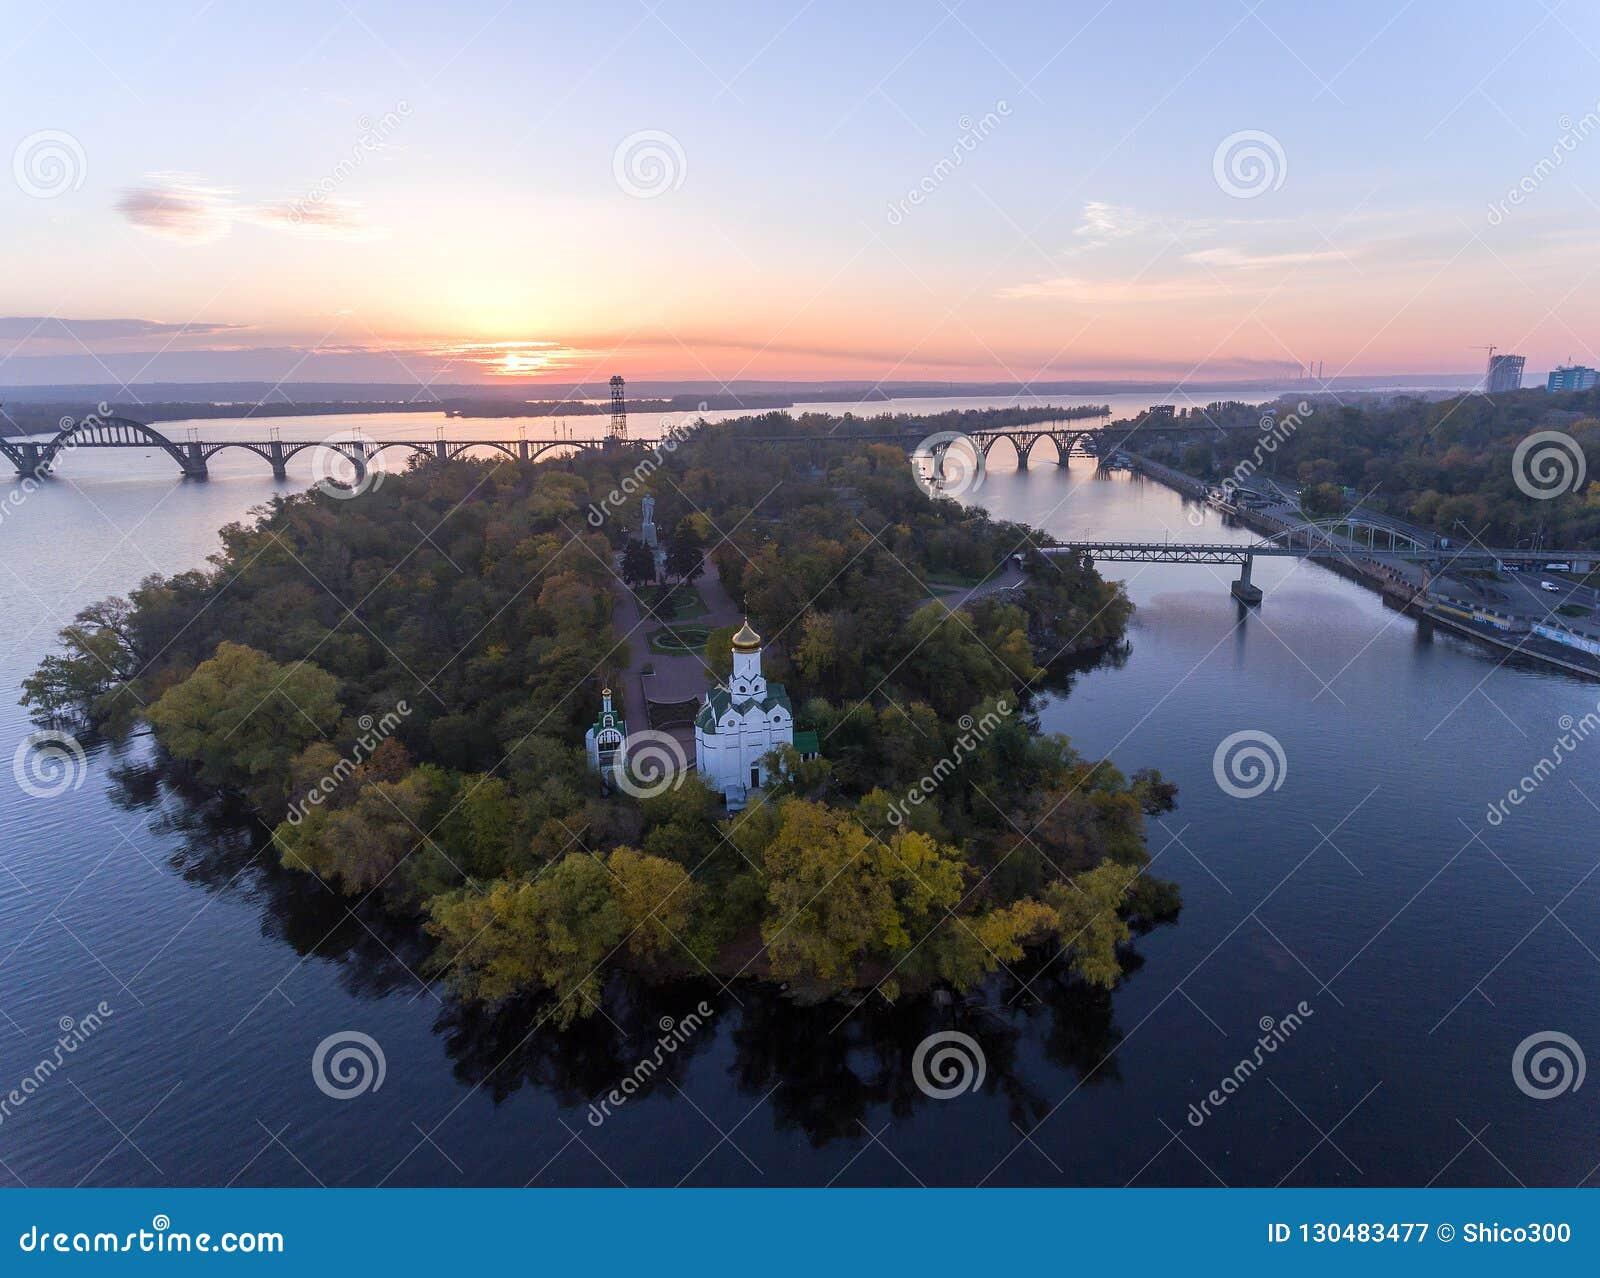 Aerial Flight over the Christian Church in the Monastic island, Dnepr City, Ukraine Dnipro, Dnepropetrovsk